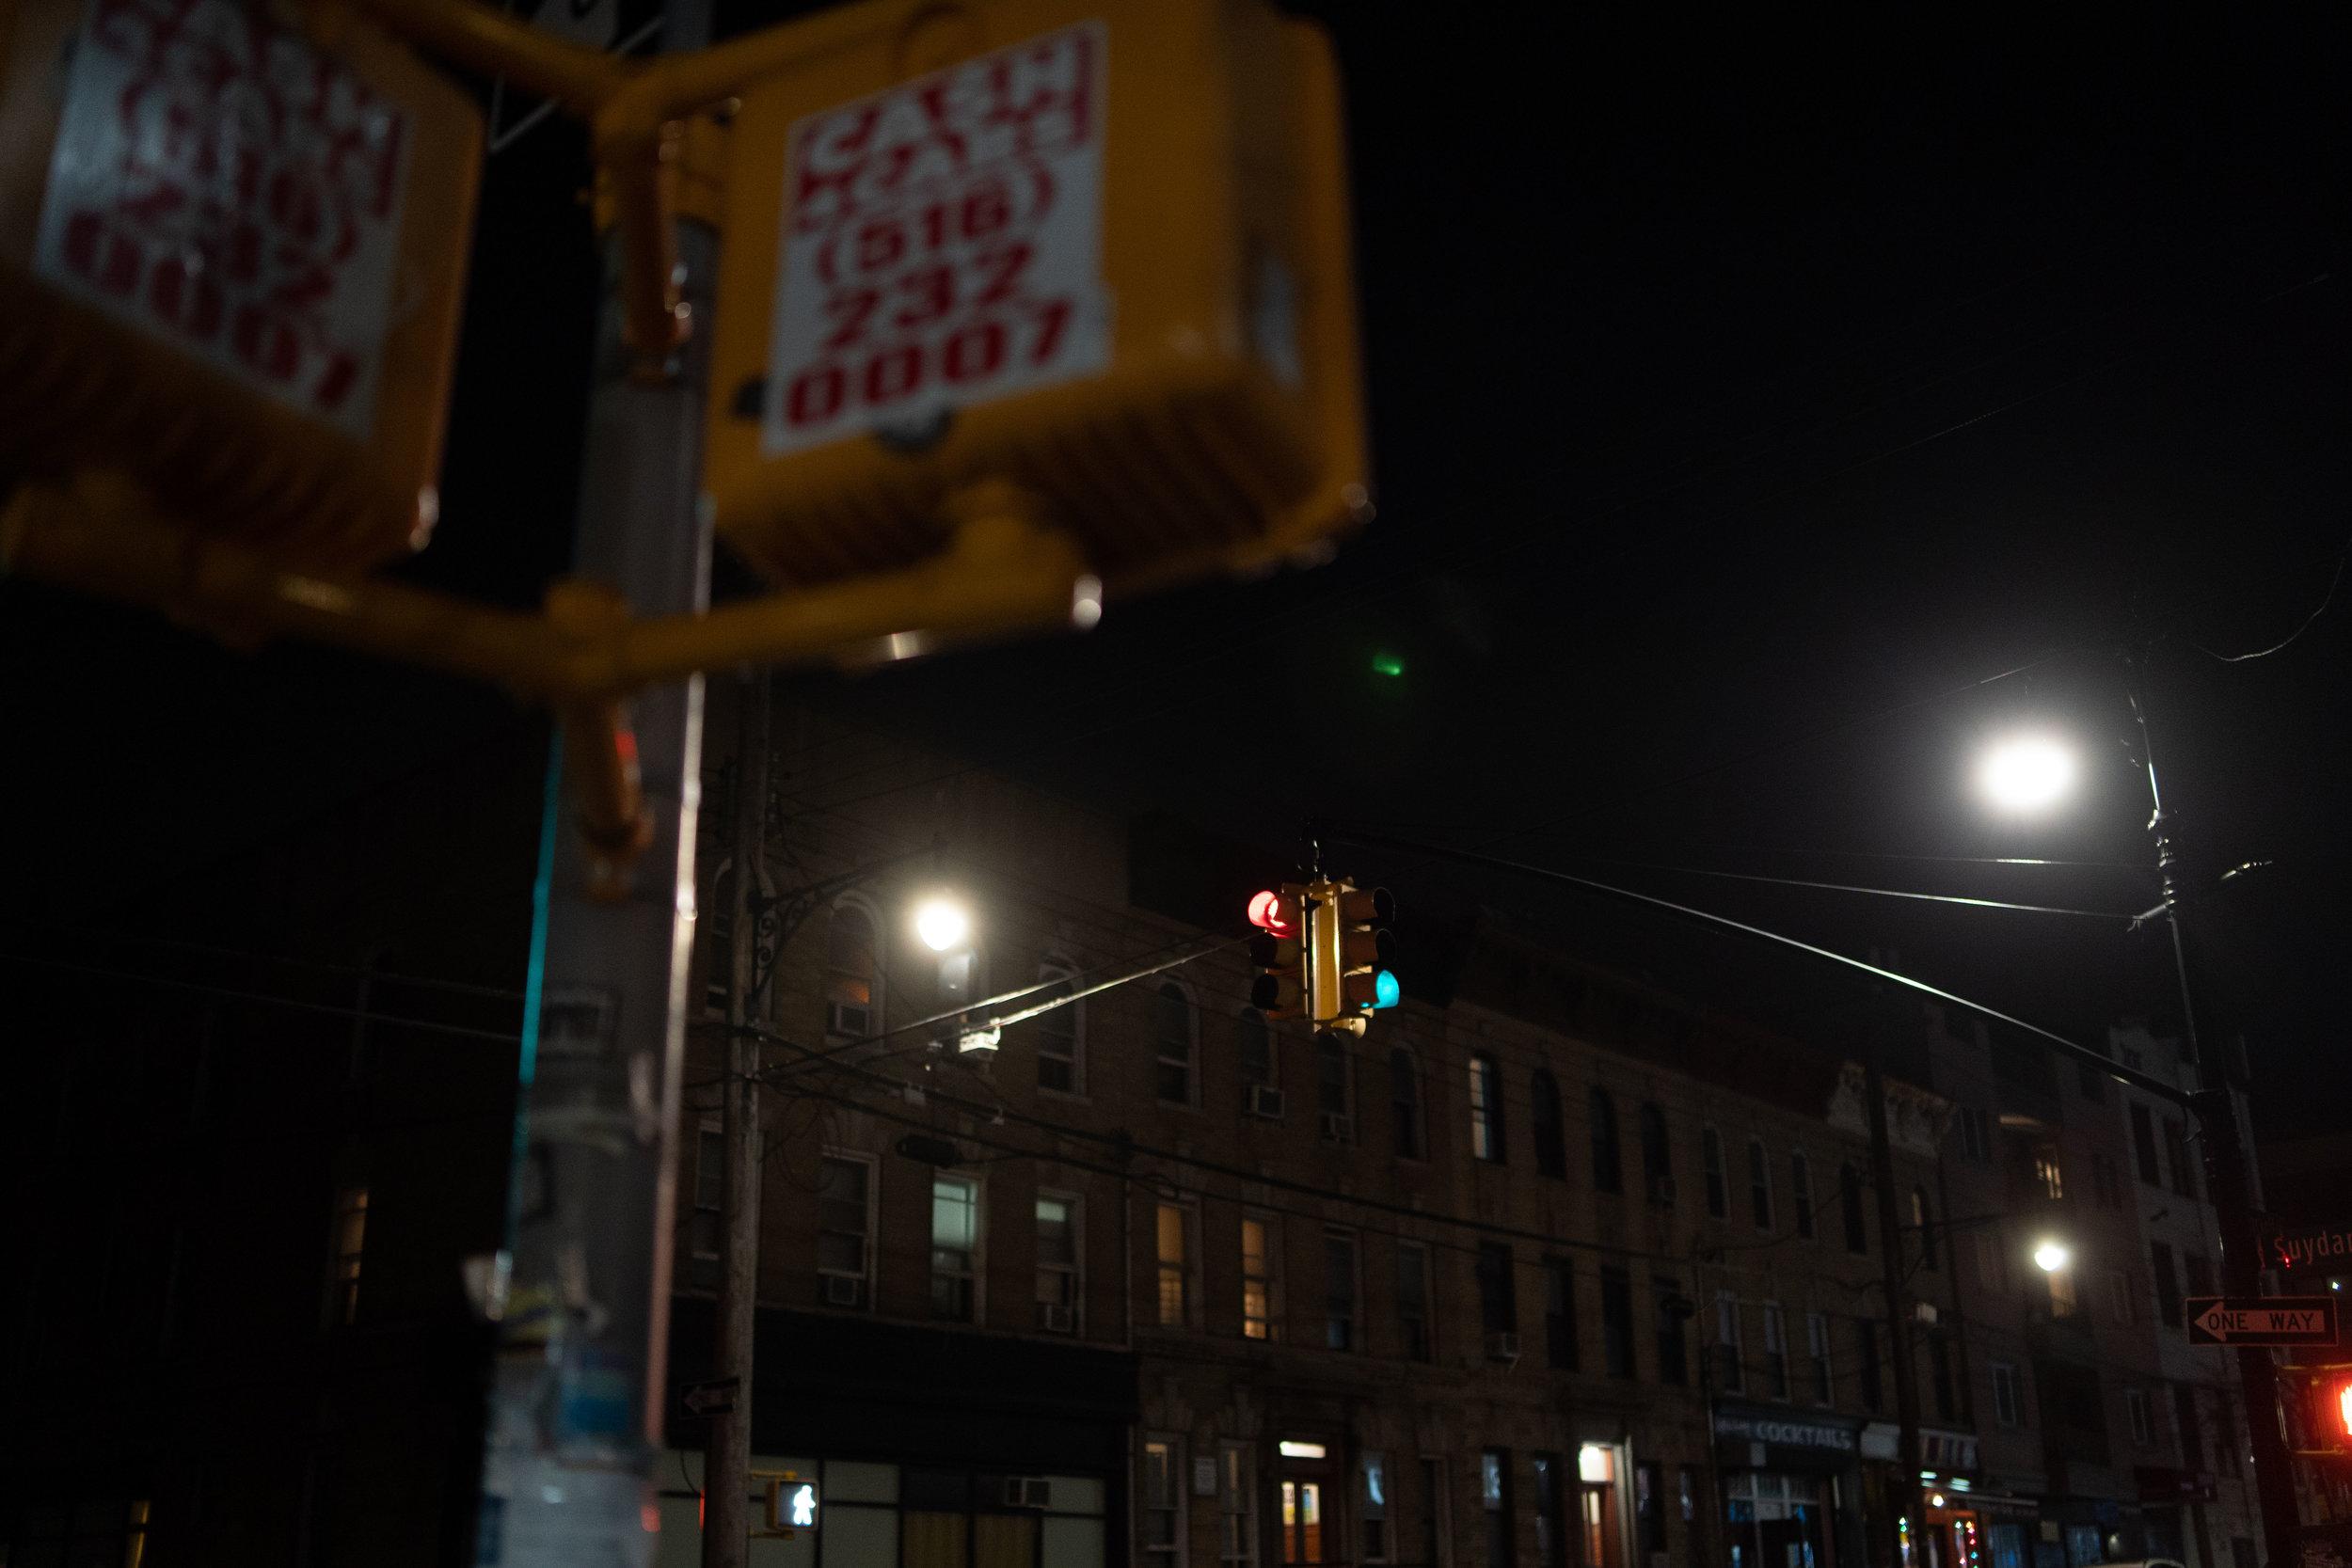 newyork-sony-101185.jpg